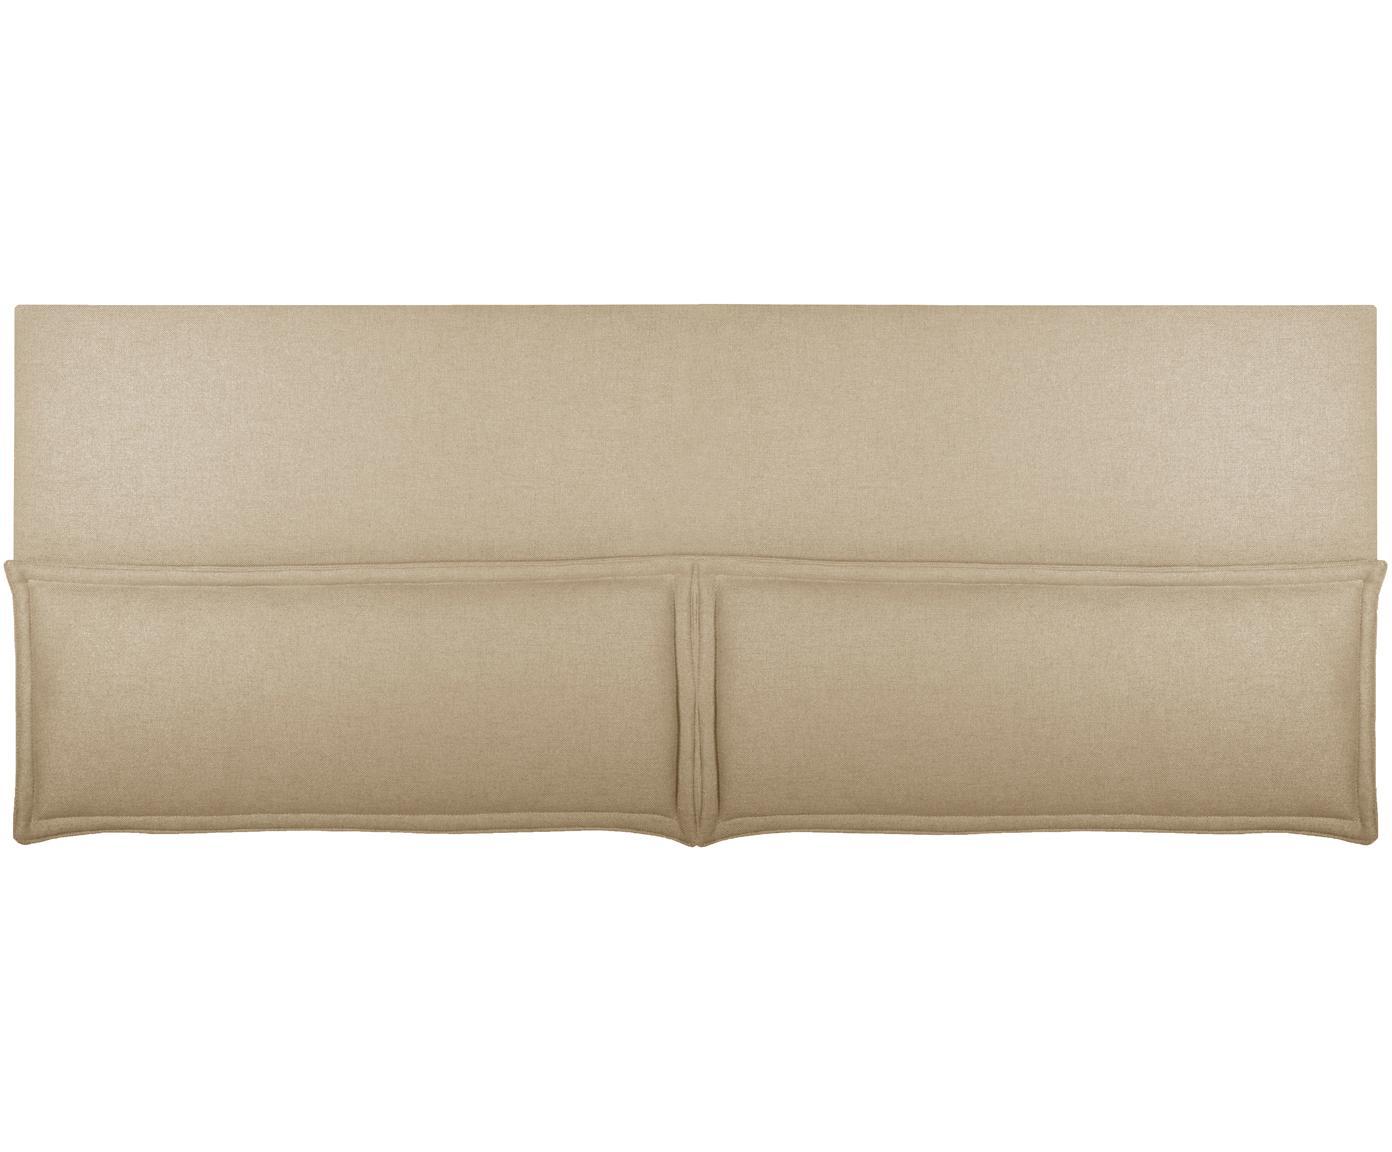 Cabecero Comfort, Estructura: madera de pino, madera co, Tapizado: 100%poliéster Alta resis, Beige, An 160 x Al 80 cm